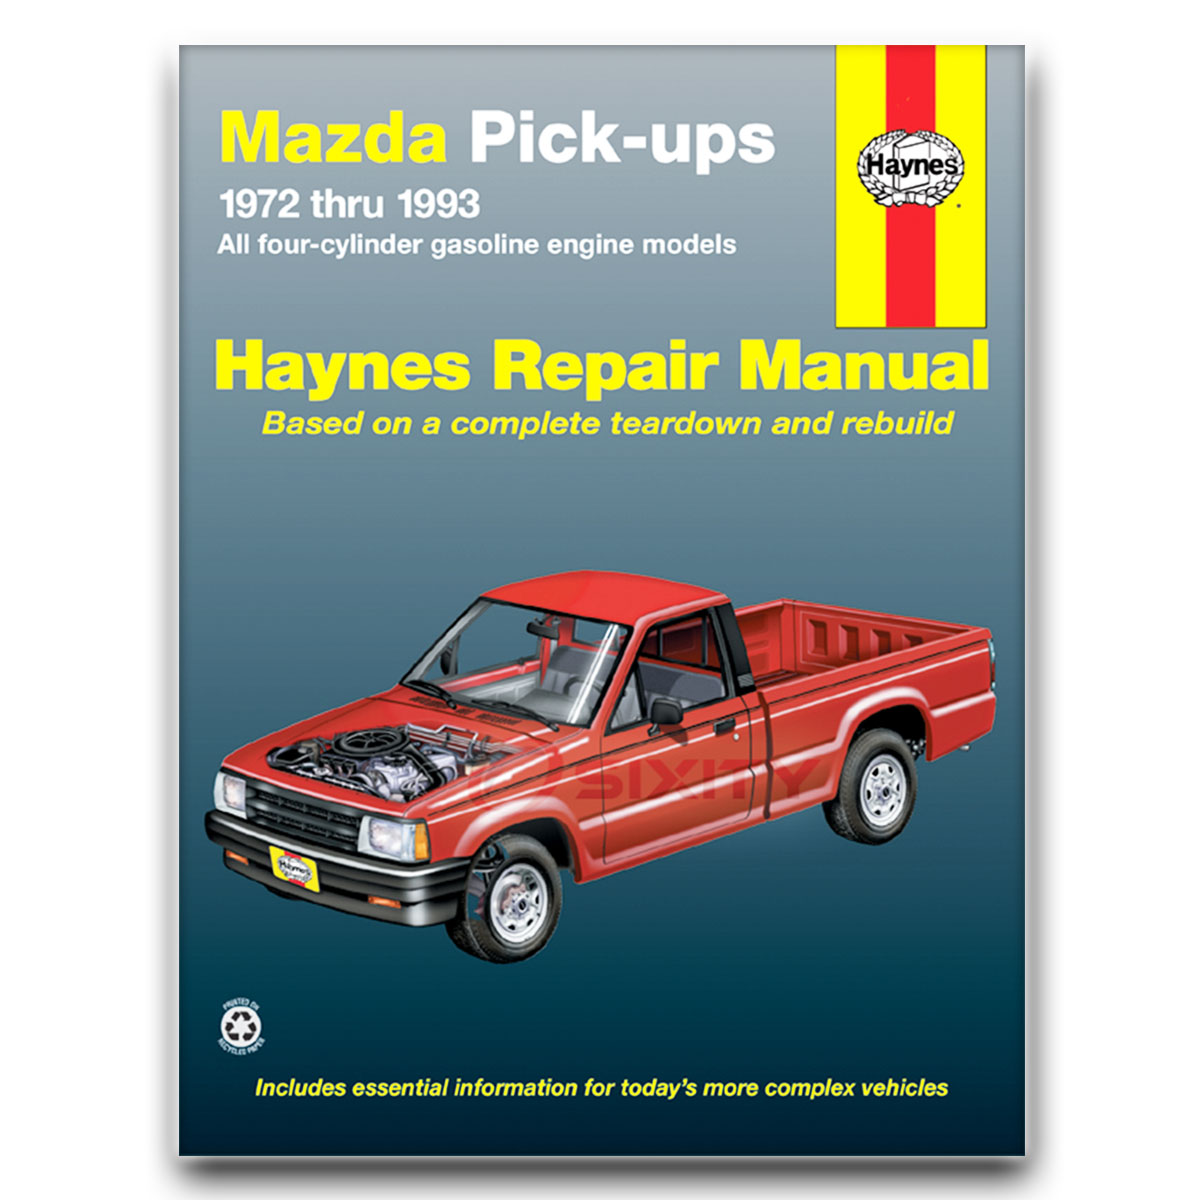 Haynes Repair Manual for Mazda B2000 Sundowner Sport LX Base SE-5 DLX Shop  ff